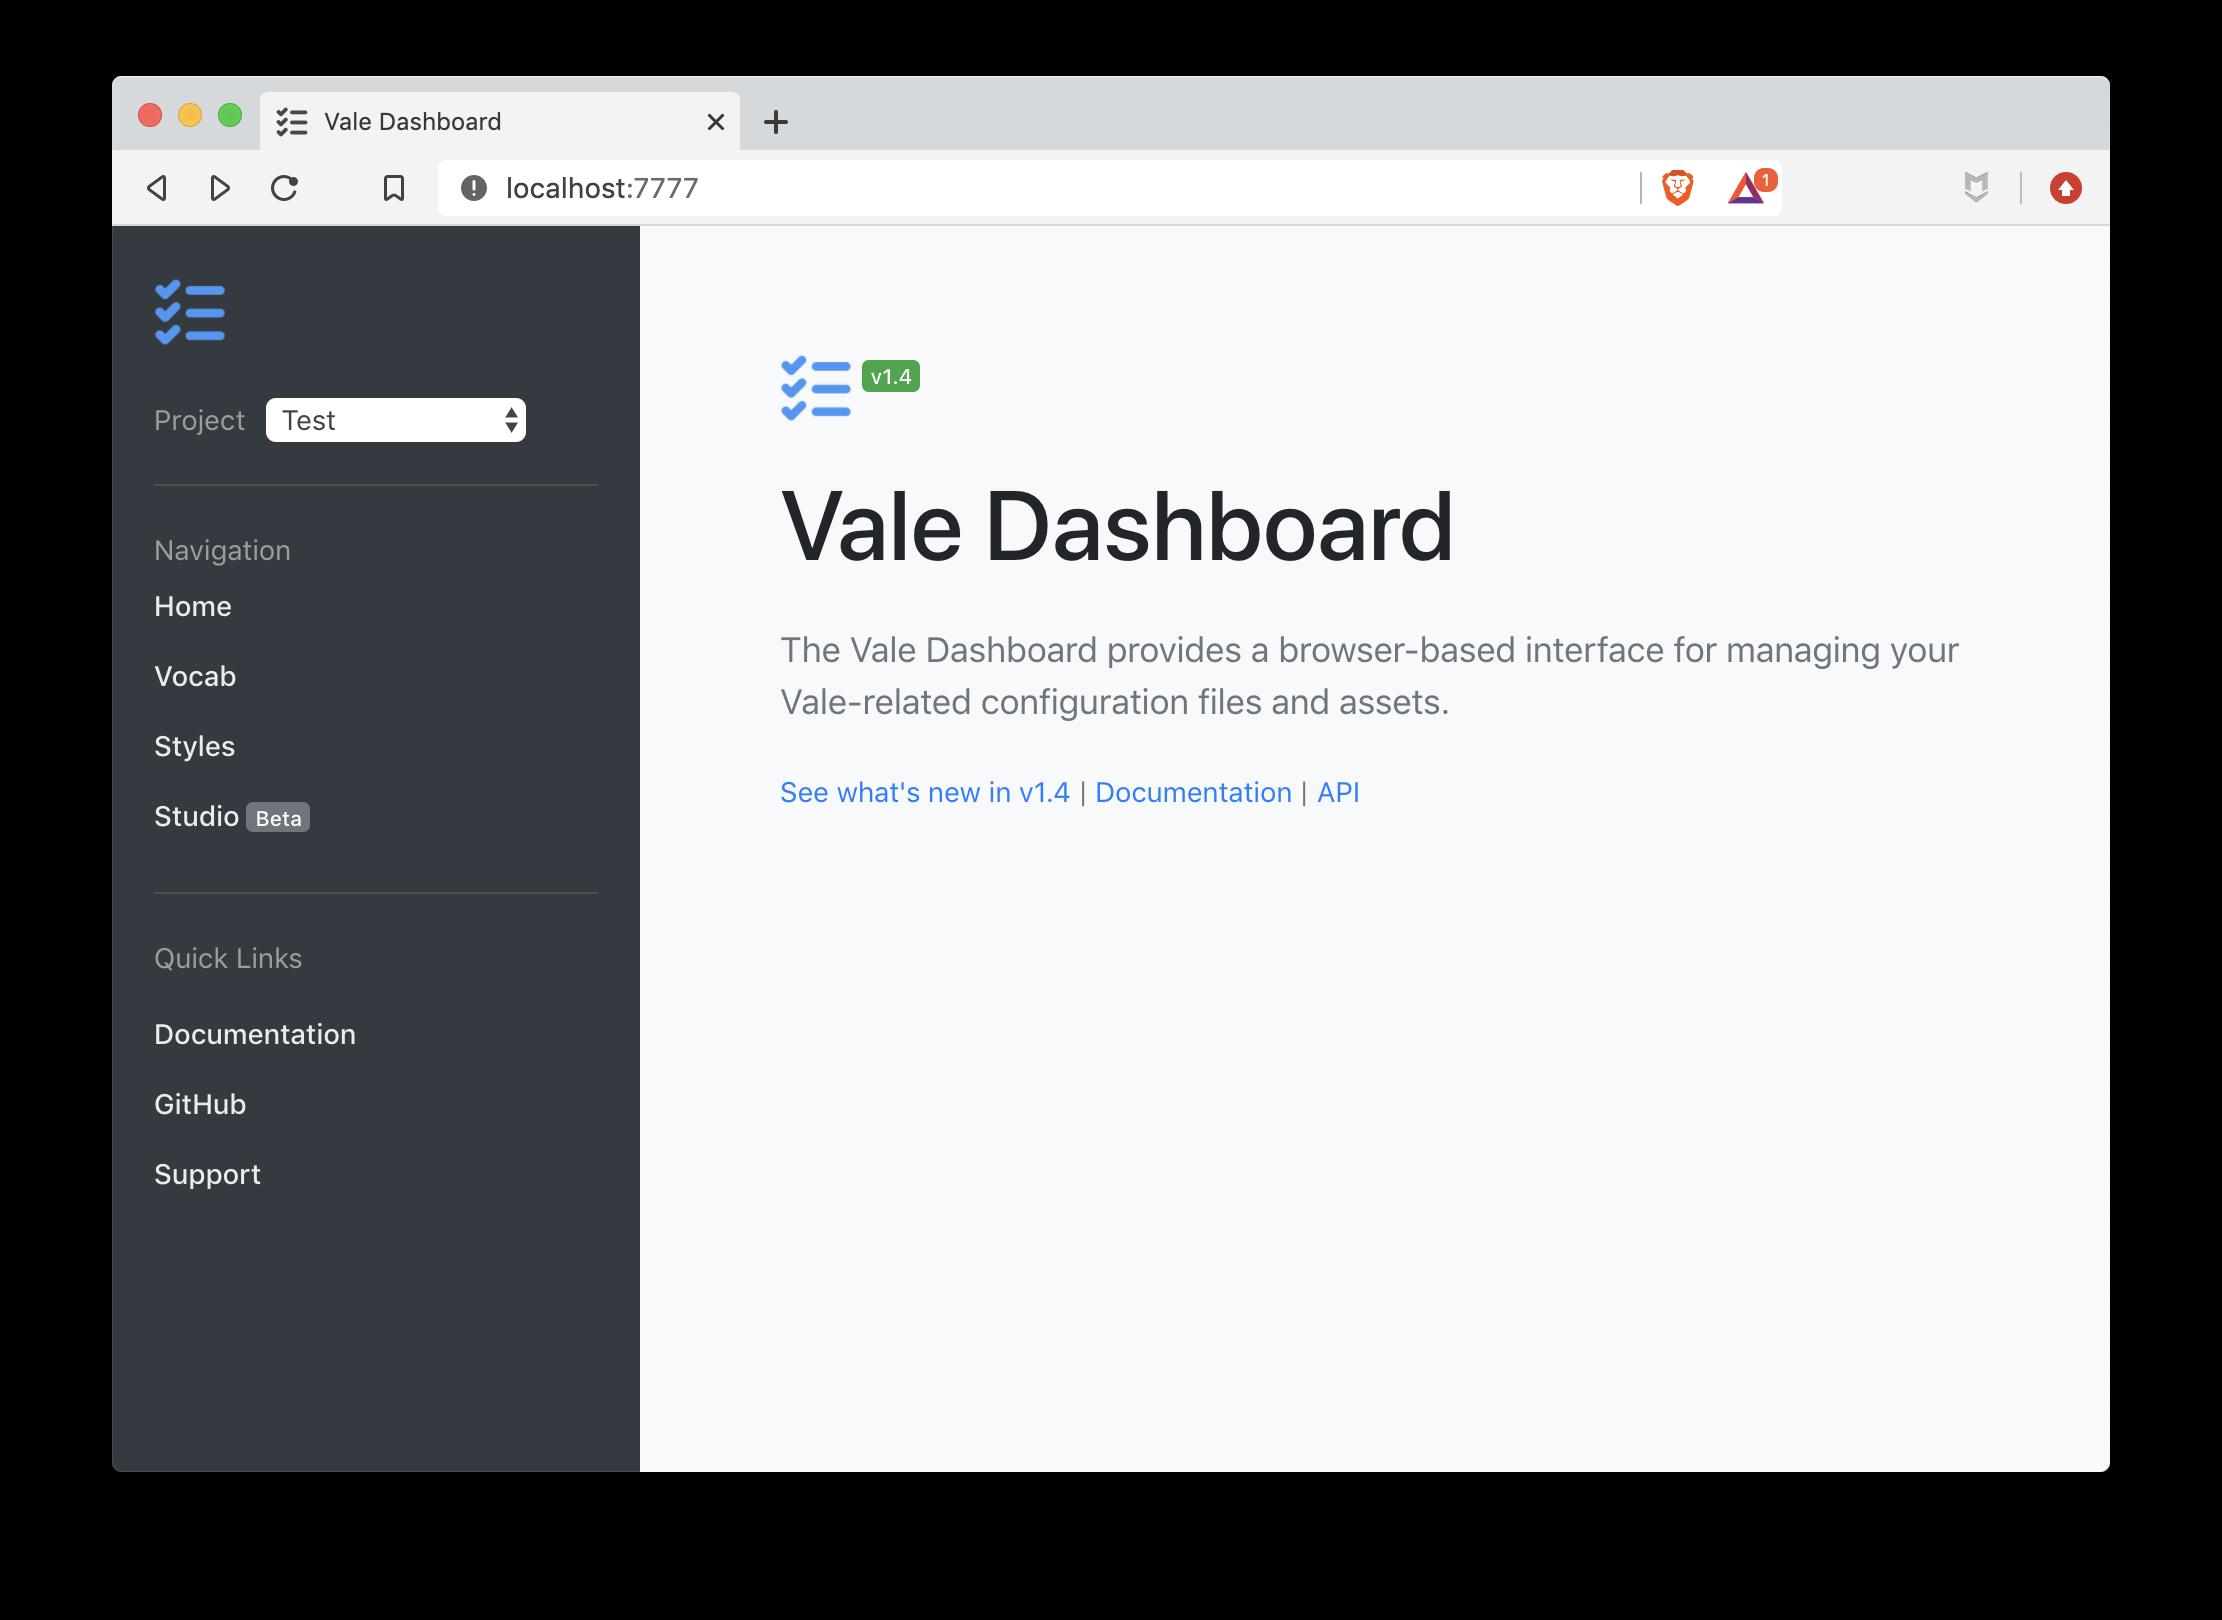 A screenshot of Vale Server's dashboard.